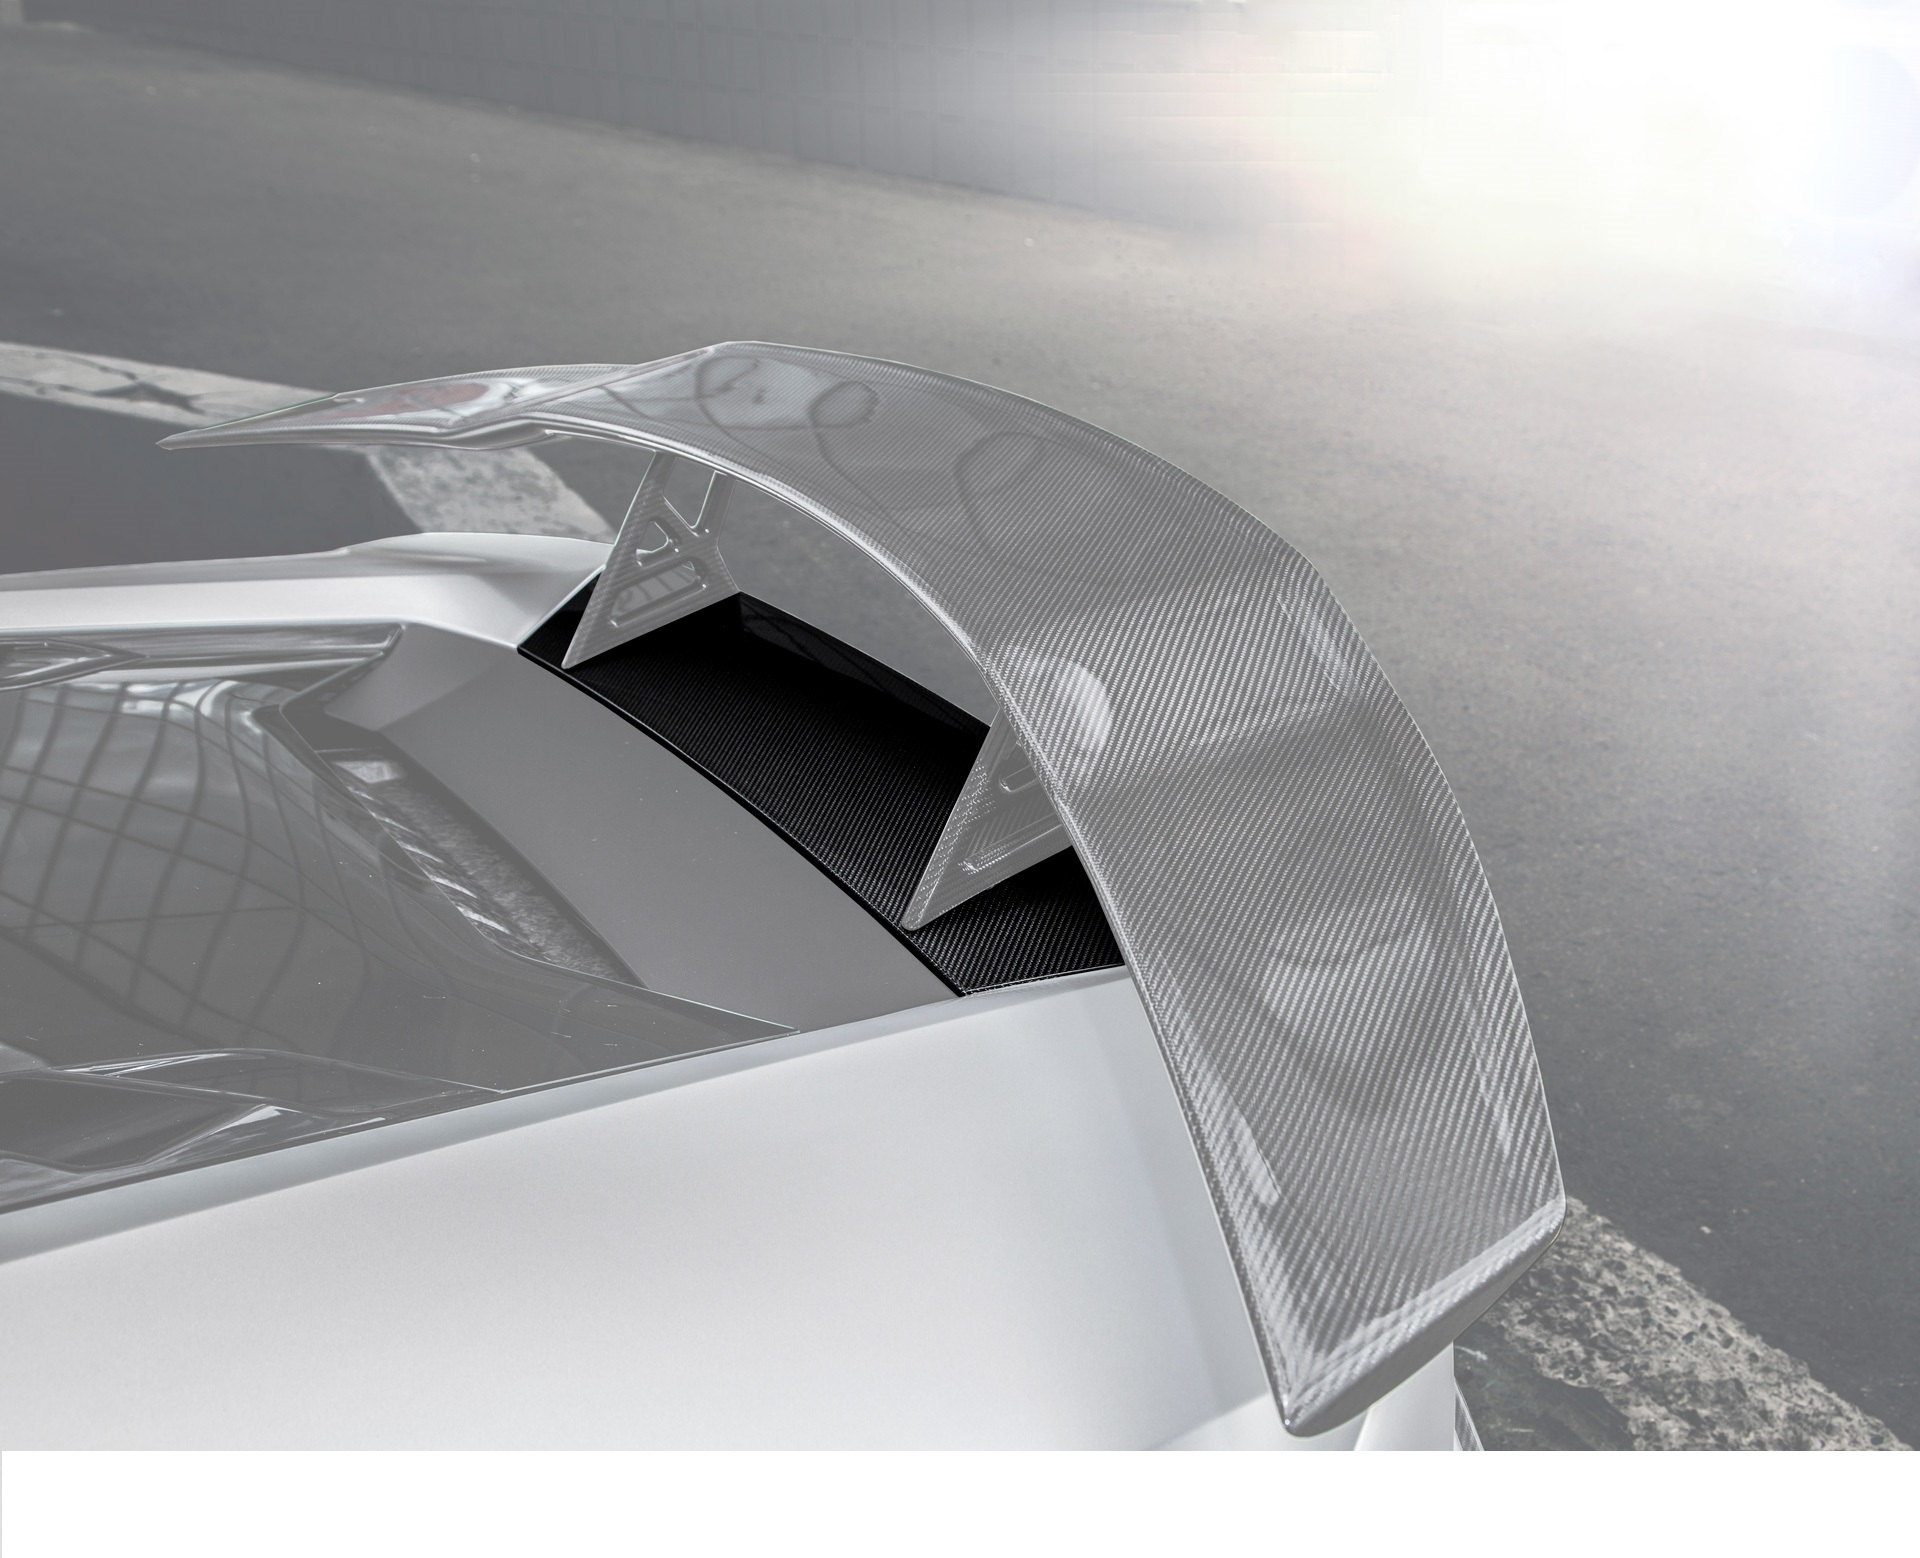 Карбоновая база под антикрыло Edition 1 Style для Mercedes GT-class C190